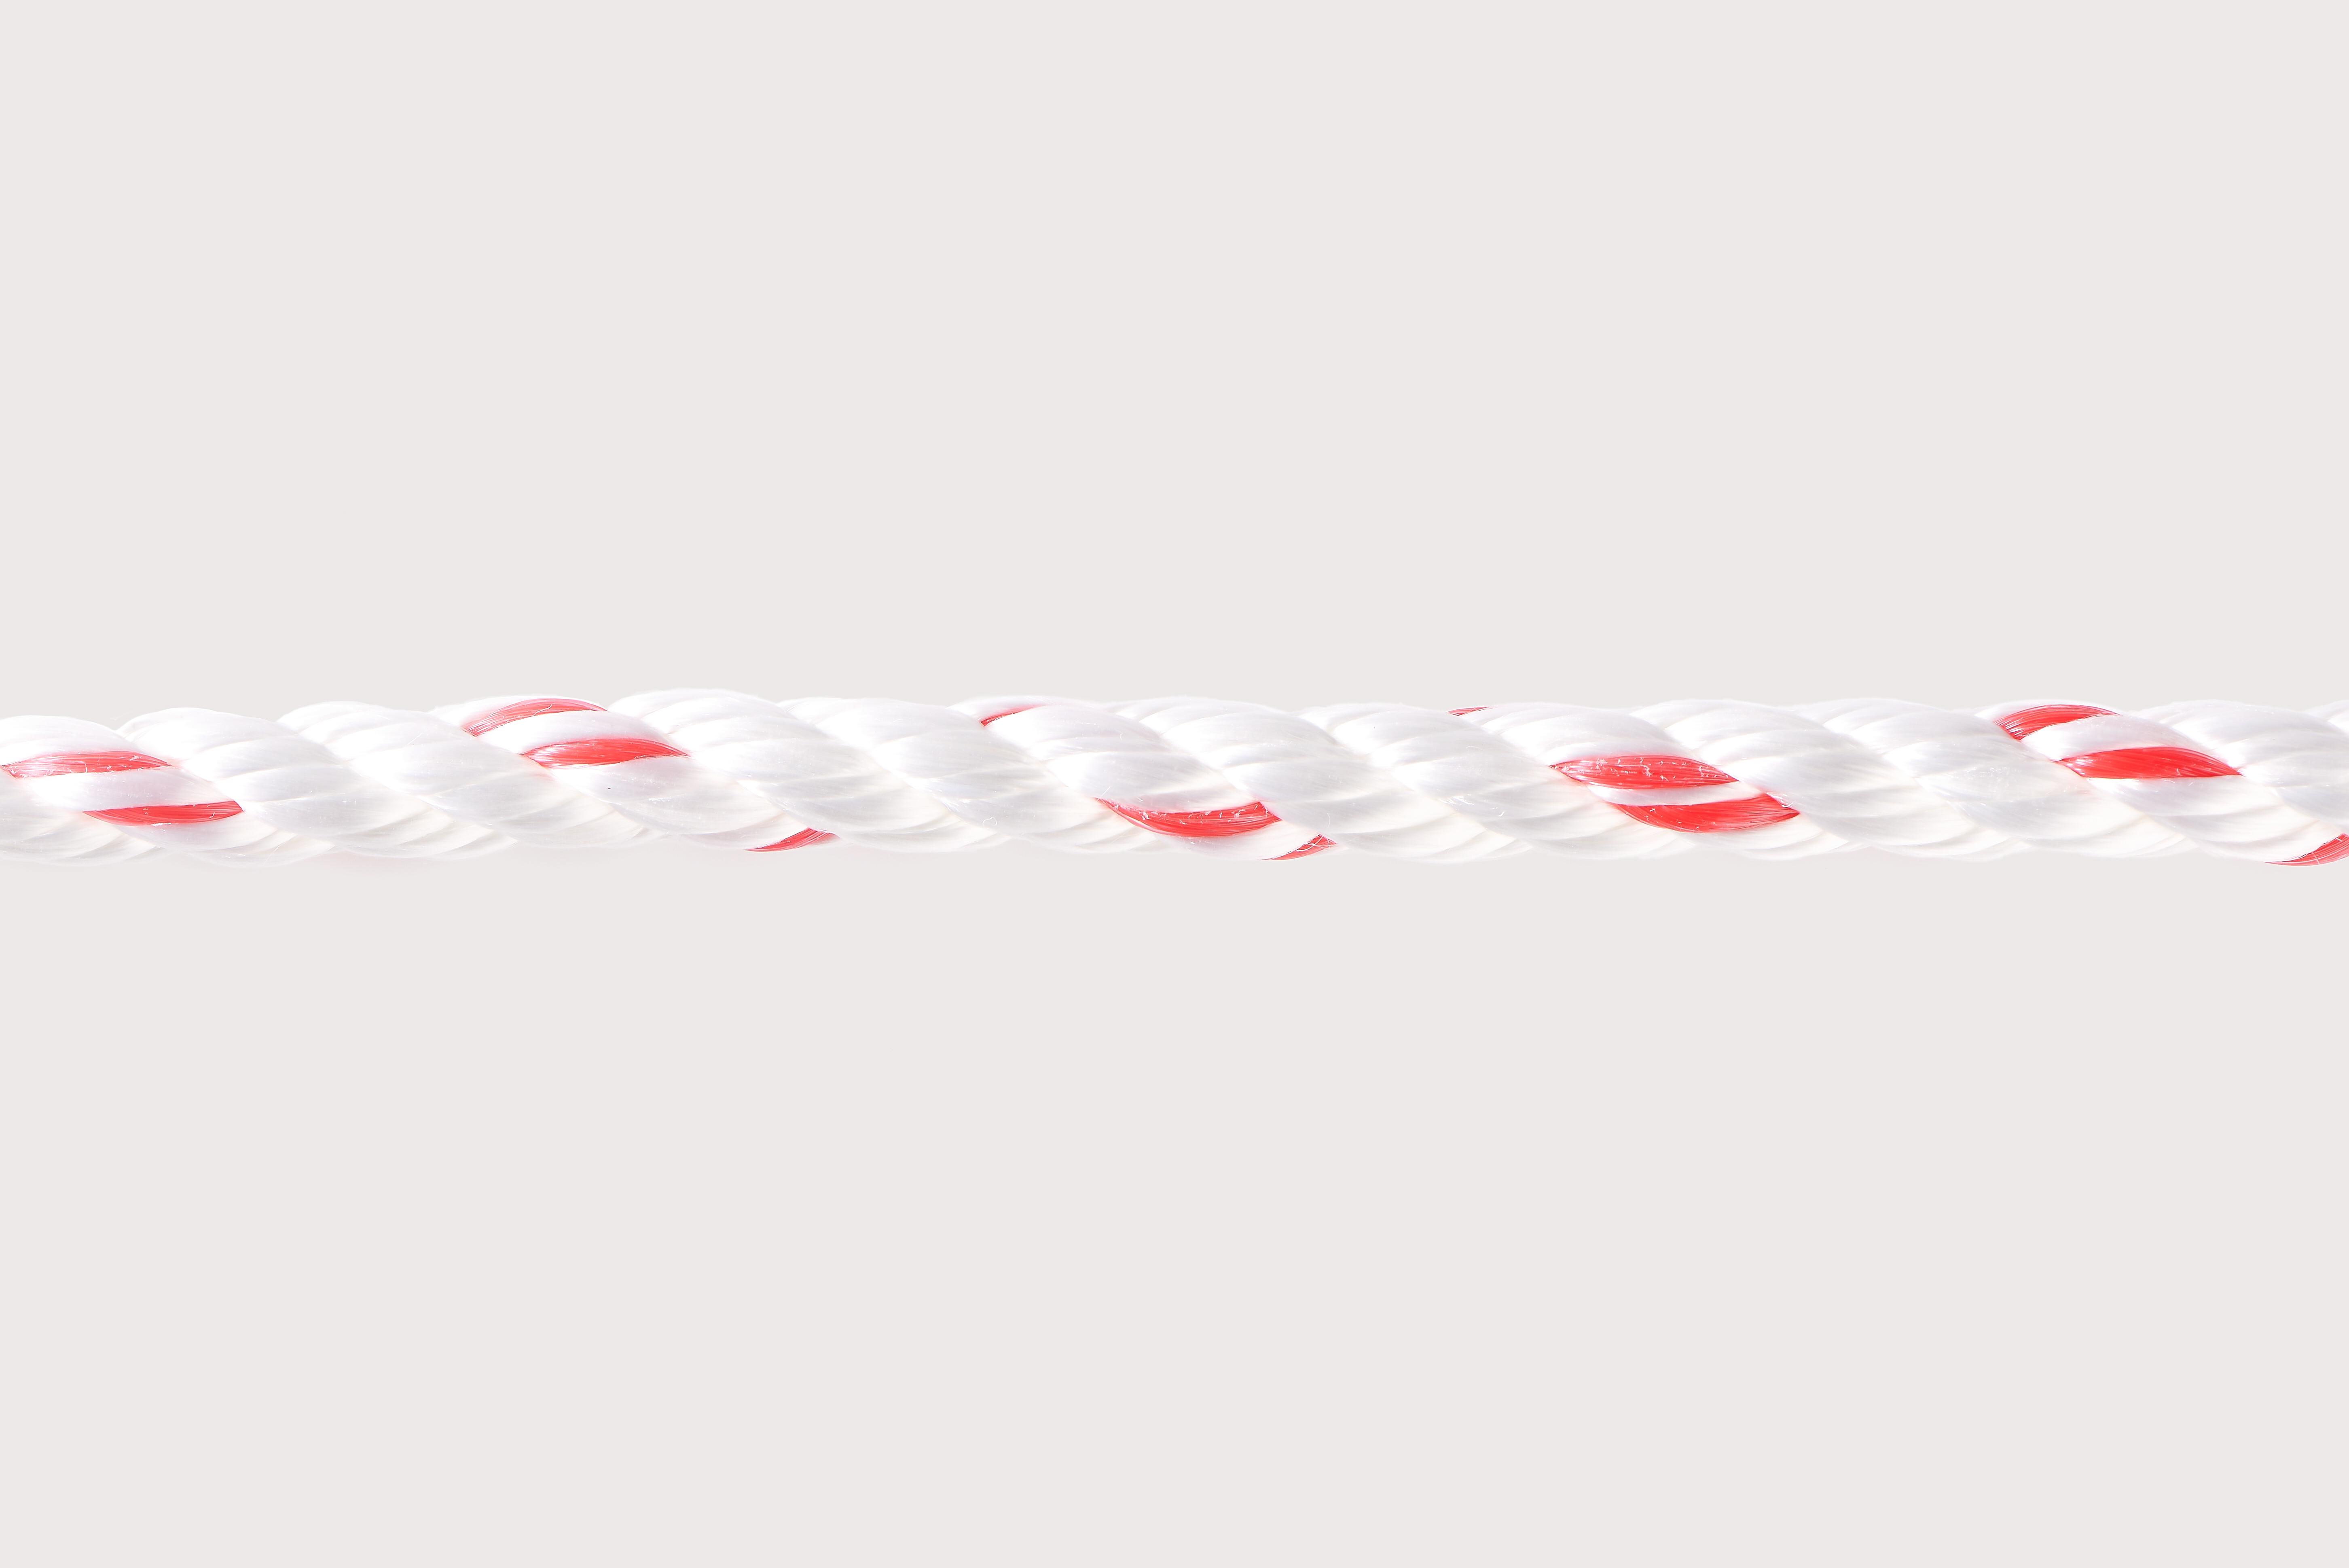 Orion-Cordage-Poly Plus Premium 3-Strand Combination-White I Red-Horizontal83.jpg